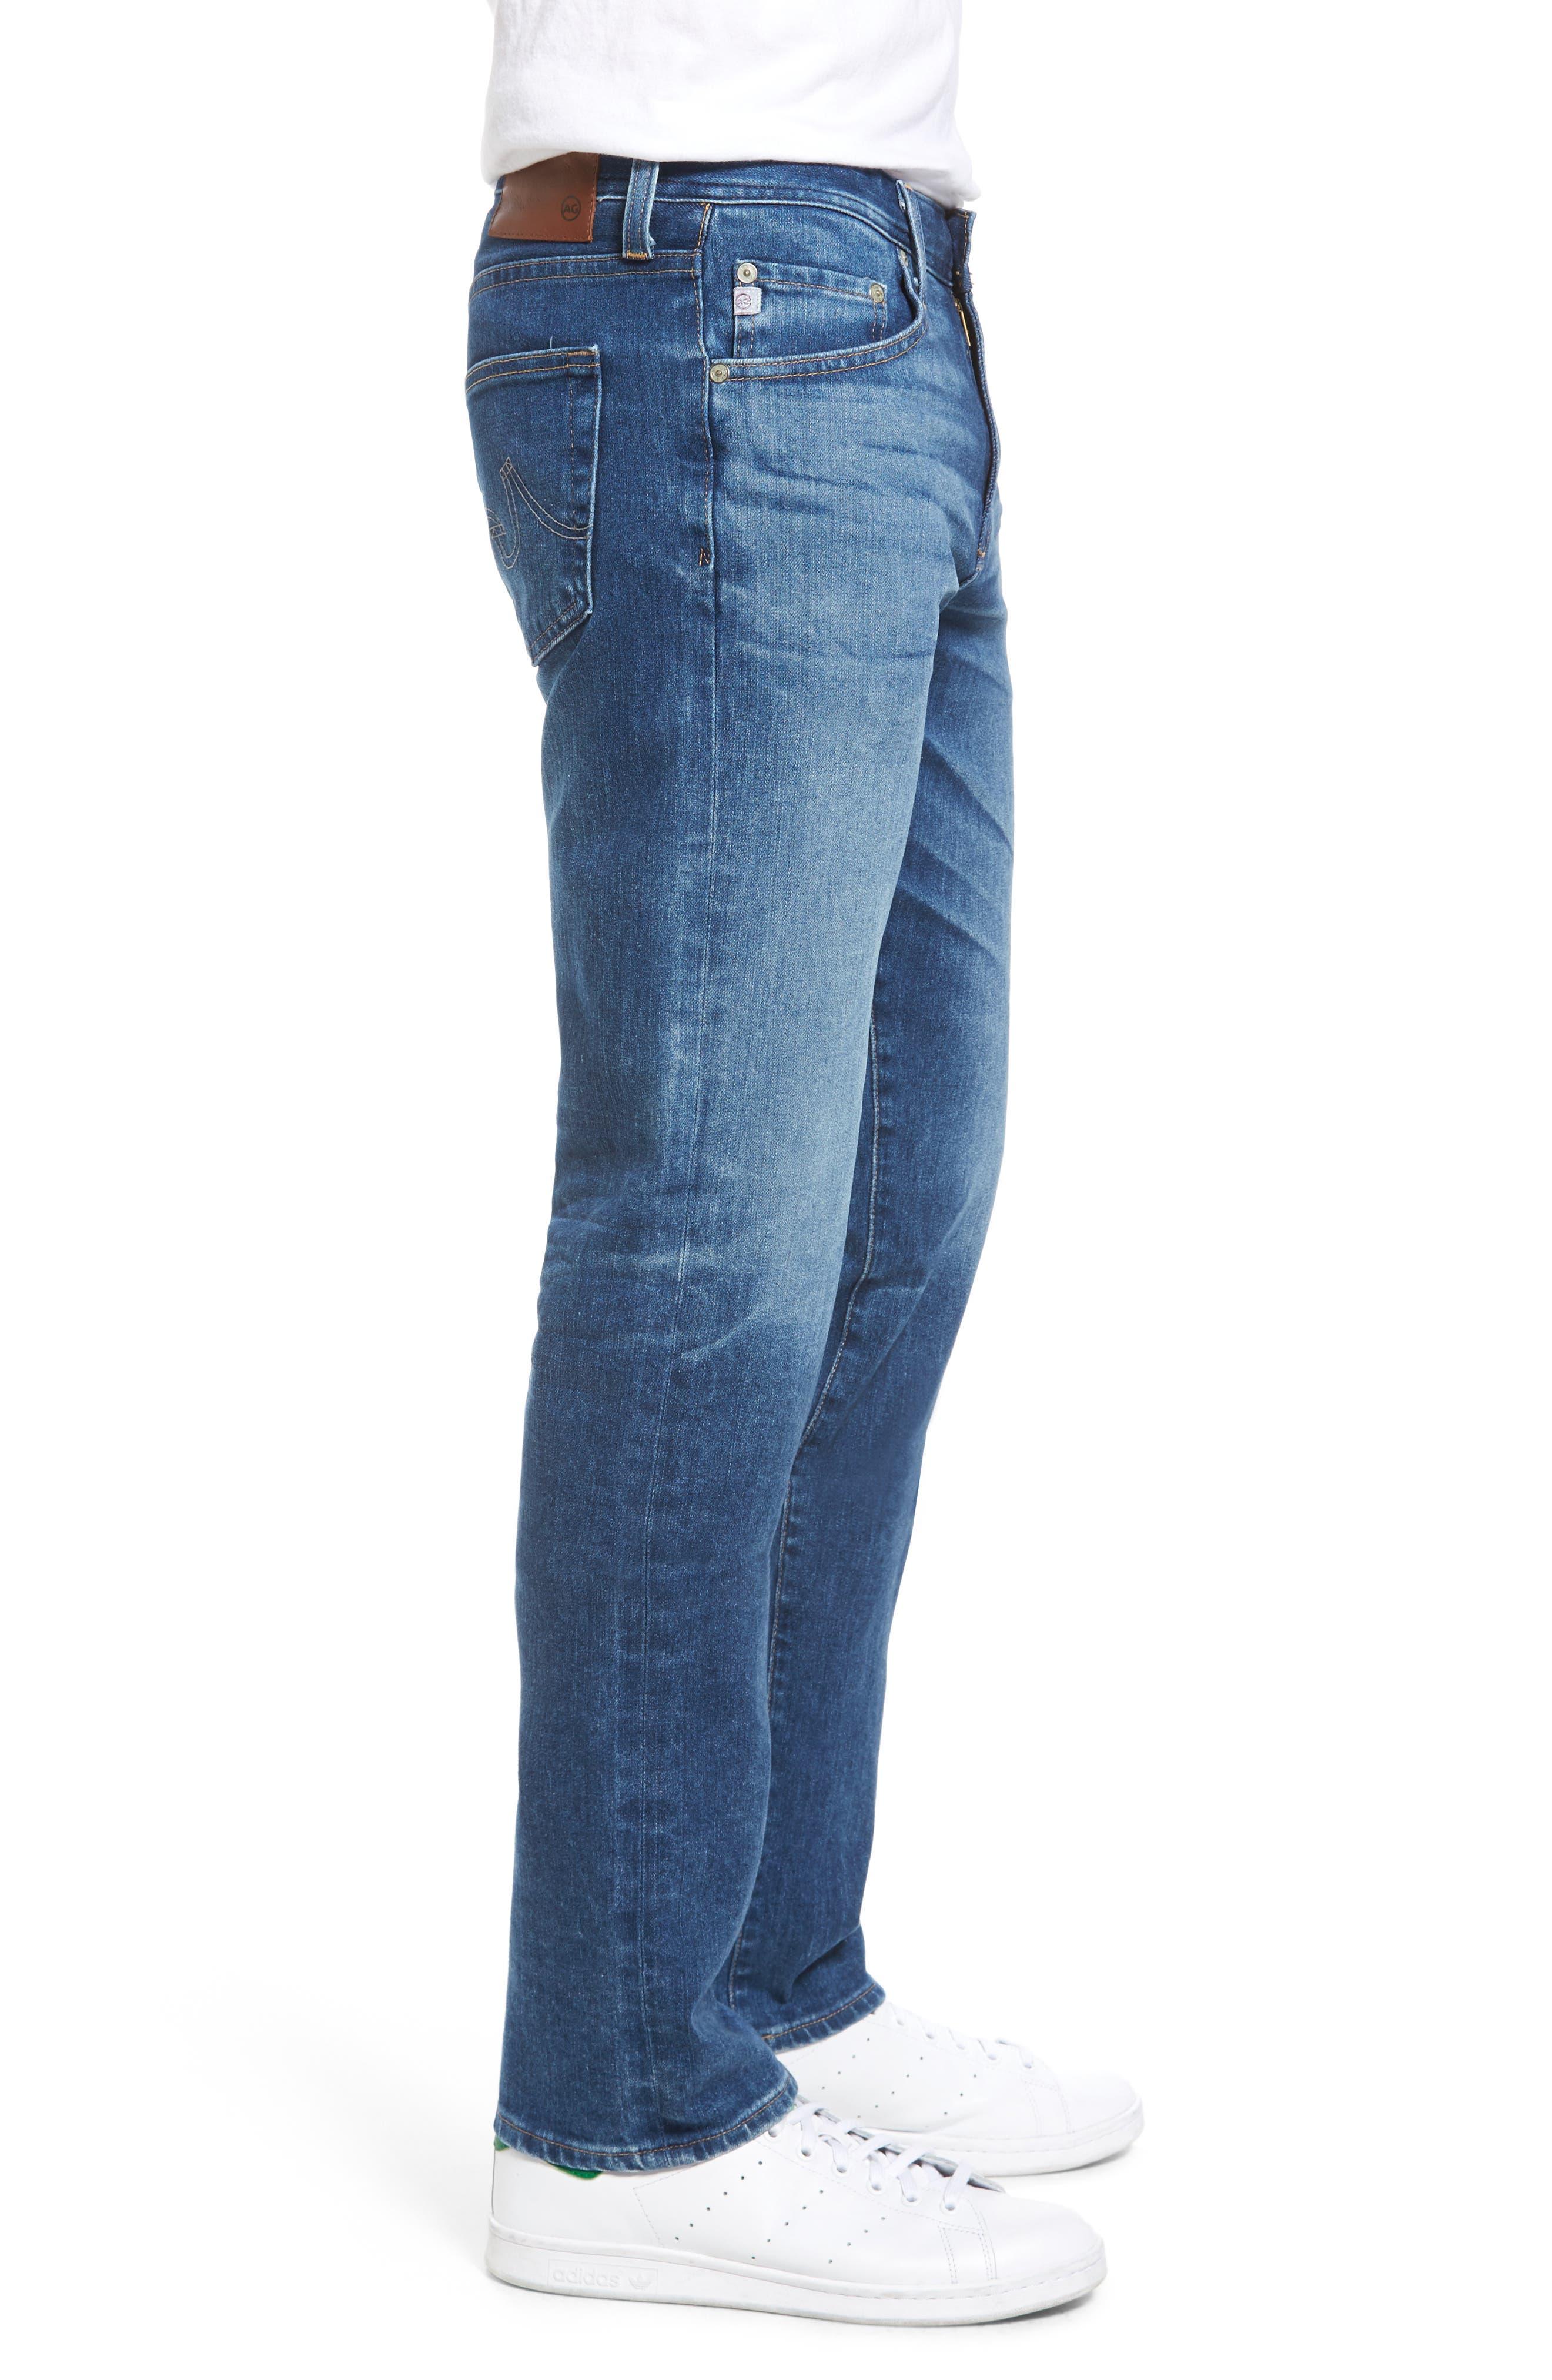 Graduate Slim Straight Leg Jeans,                             Alternate thumbnail 3, color,                             11 Years Delom